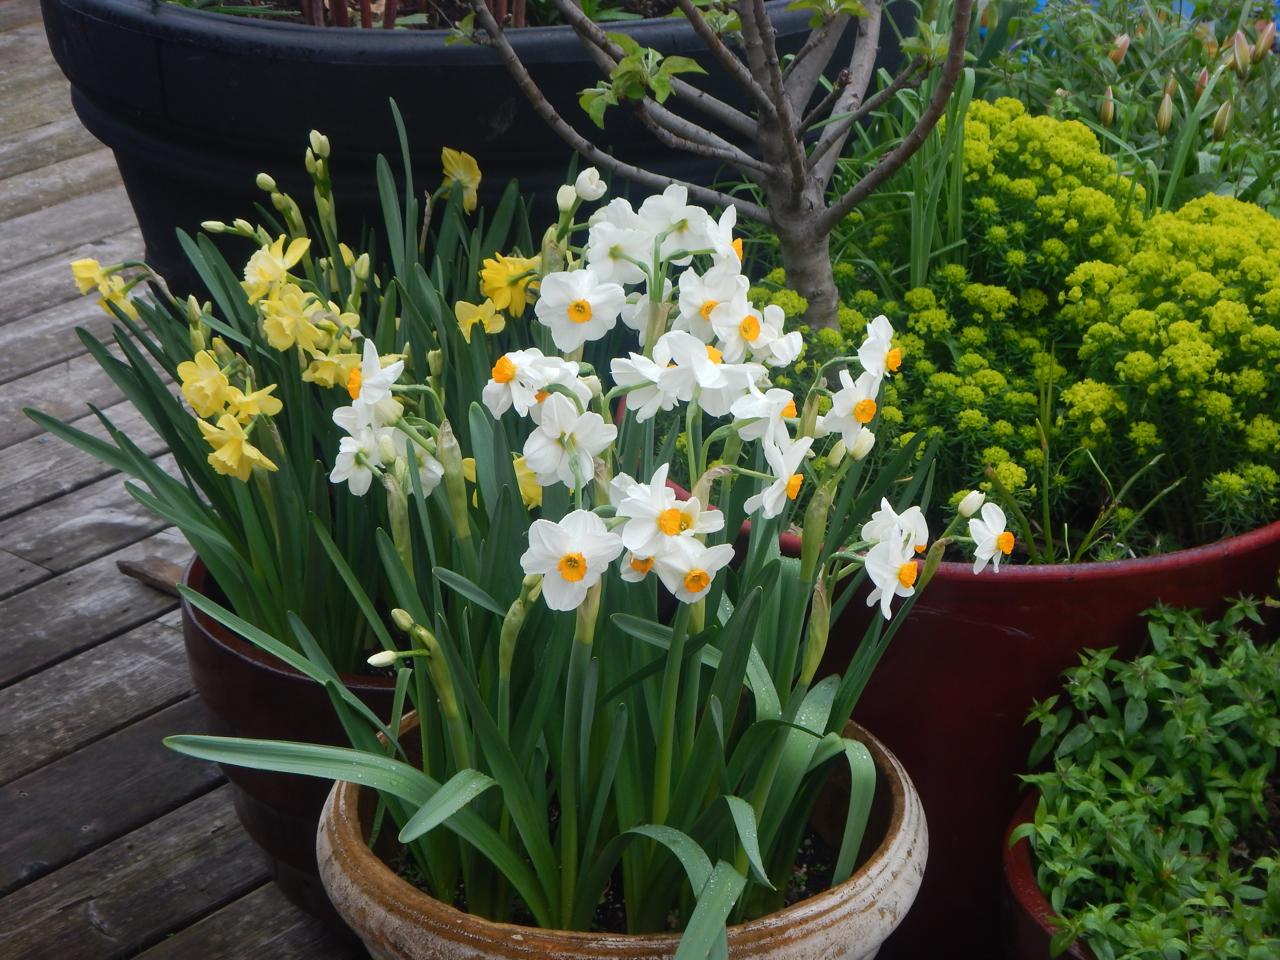 Daffodil Award2018 Mossies - Geranium Daffodil (Narcissus  'Geranium')